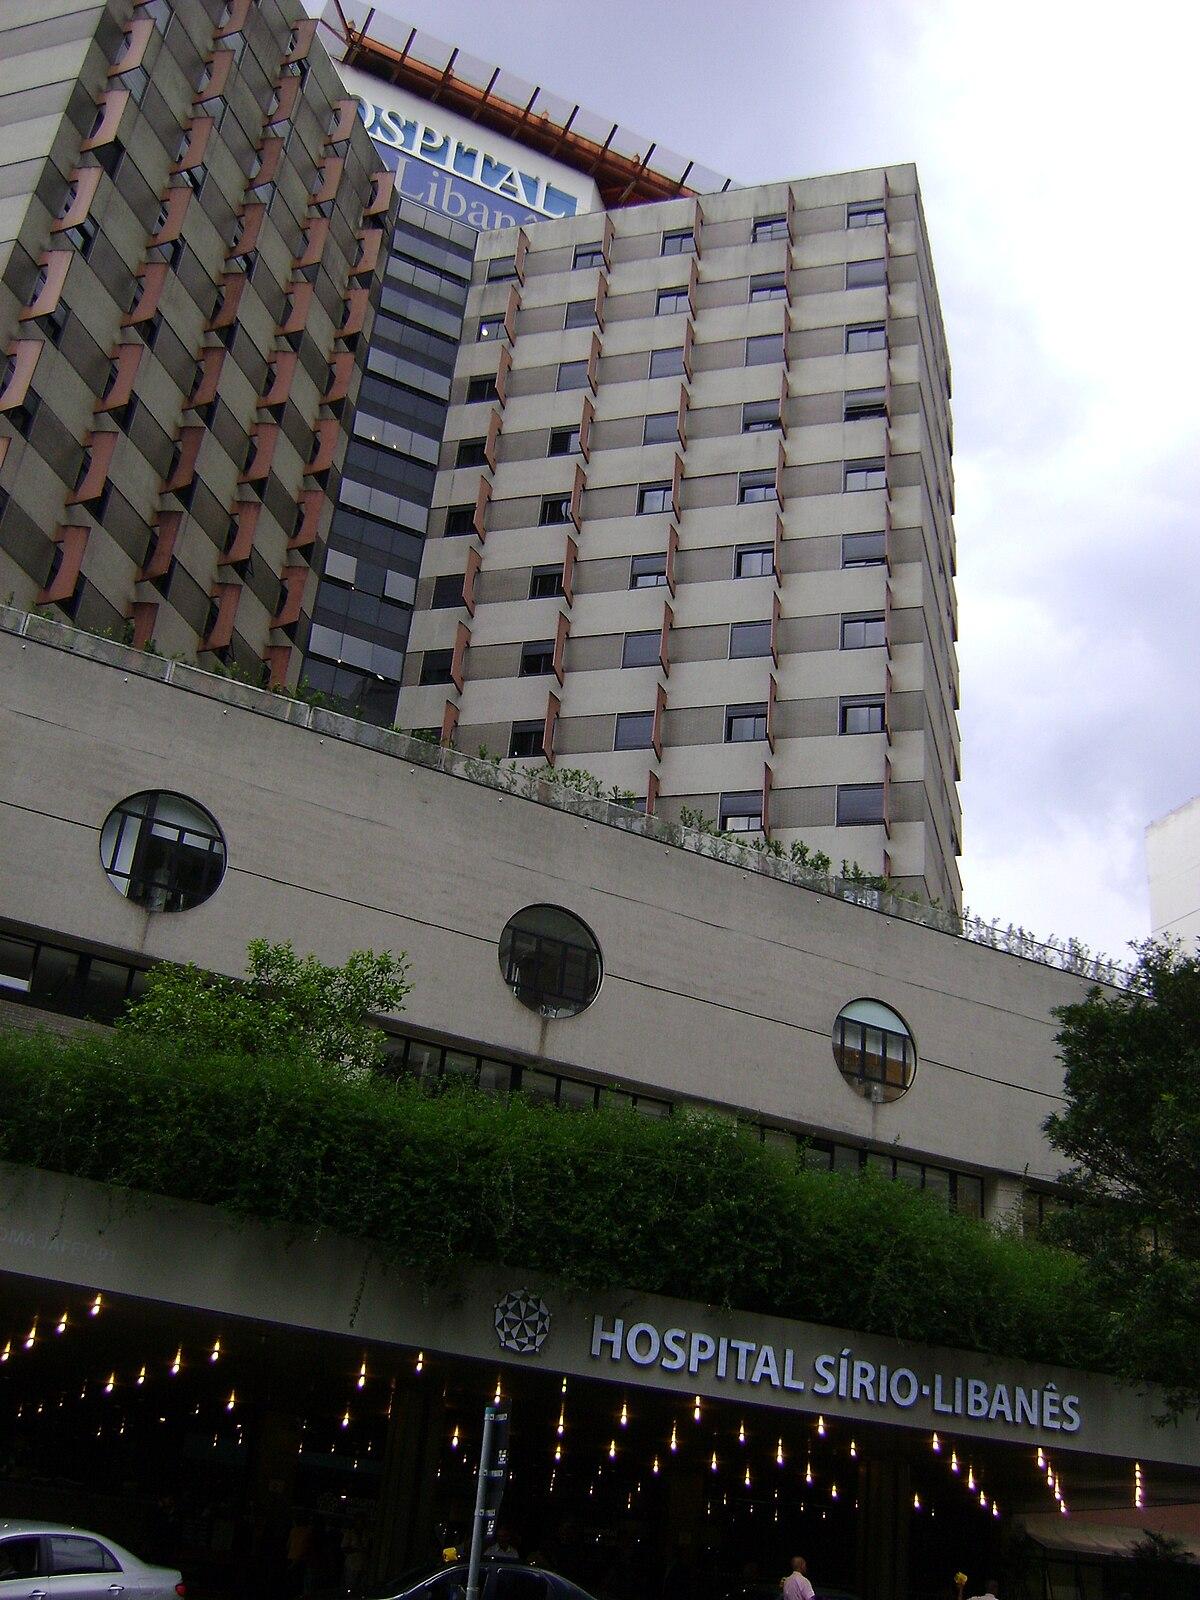 Hospital s rio liban s wikip dia a enciclop dia livre - Hospital sirio libanes sao paulo ...